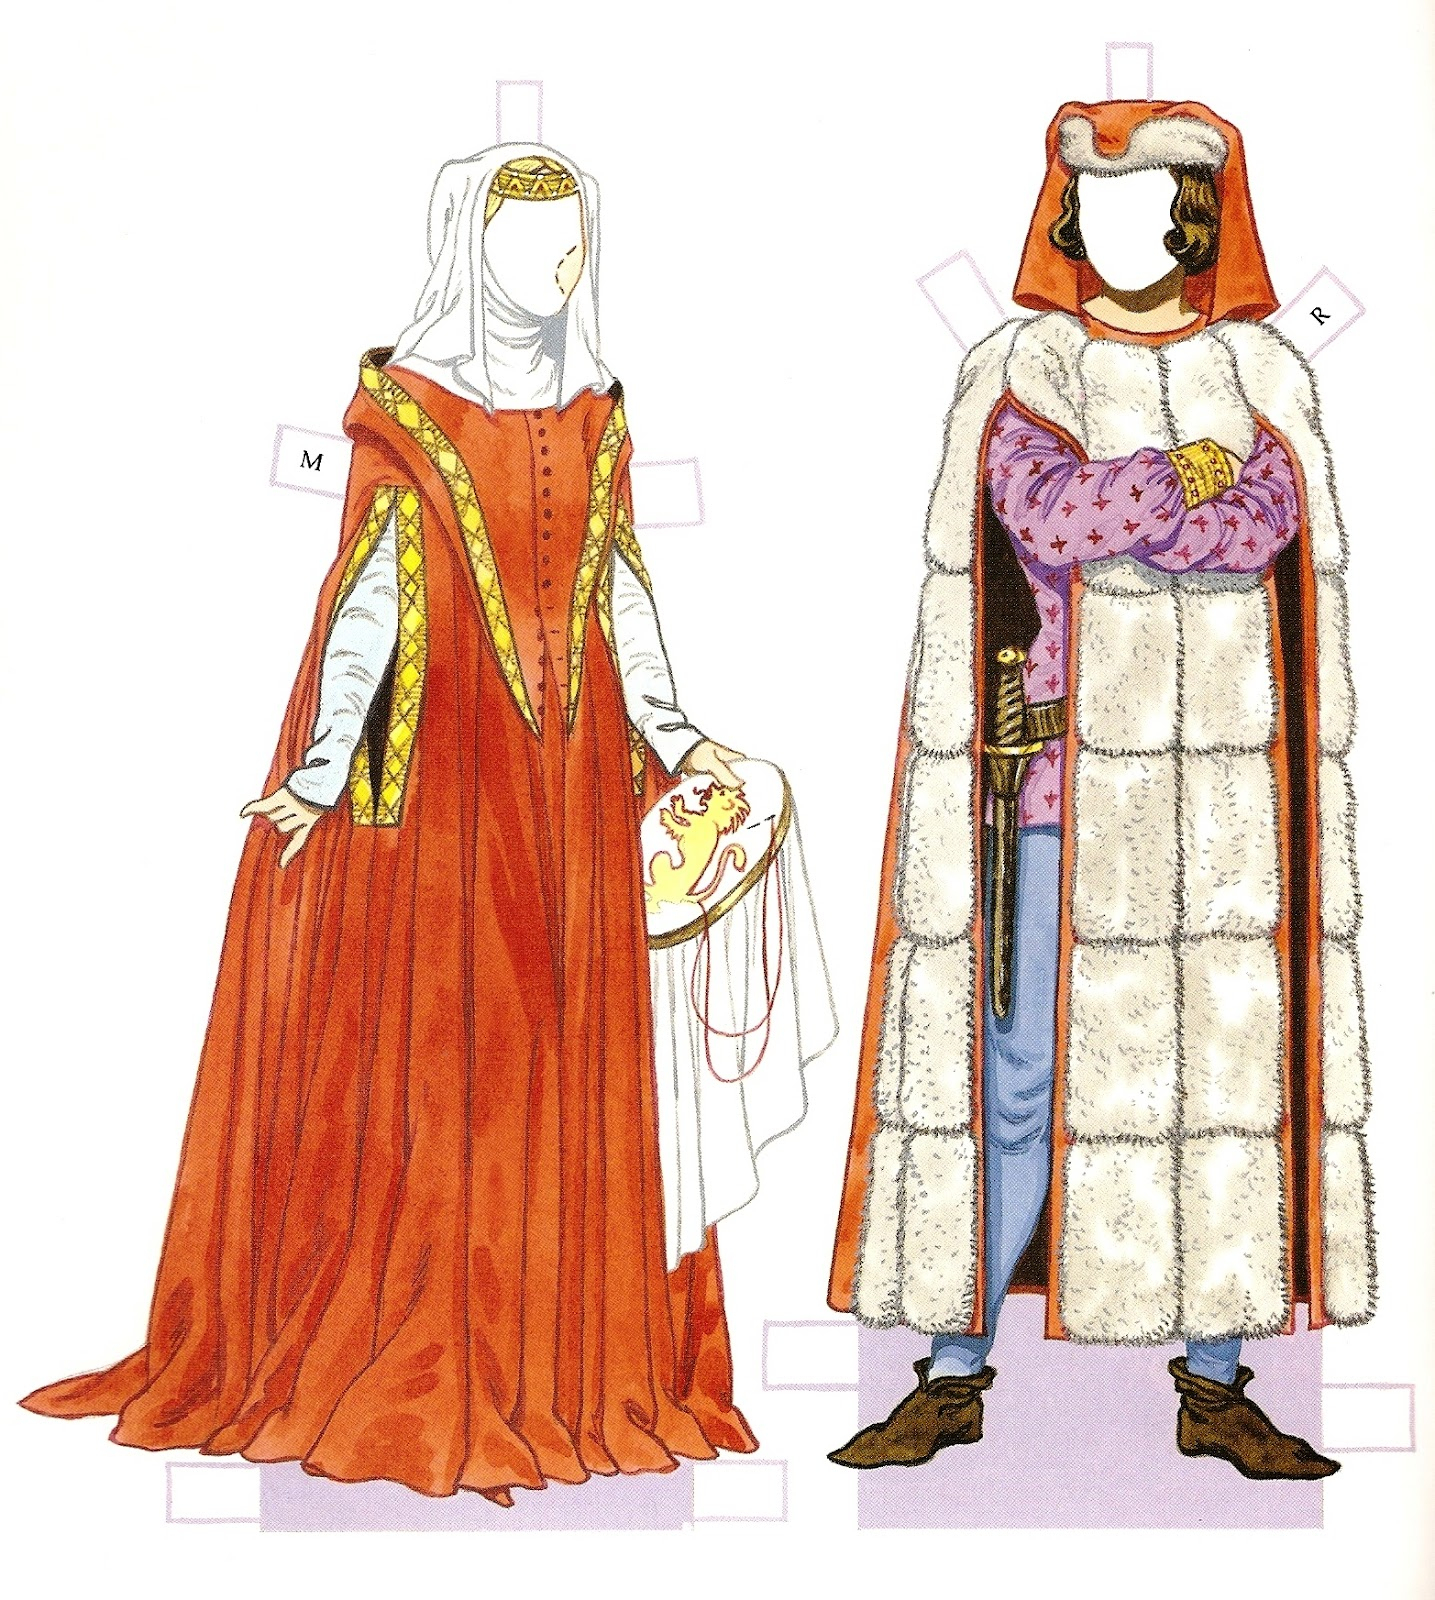 Medieval Paper Dolls Printable | Download Them Or Print - Medieval Paper Dolls Free Printable